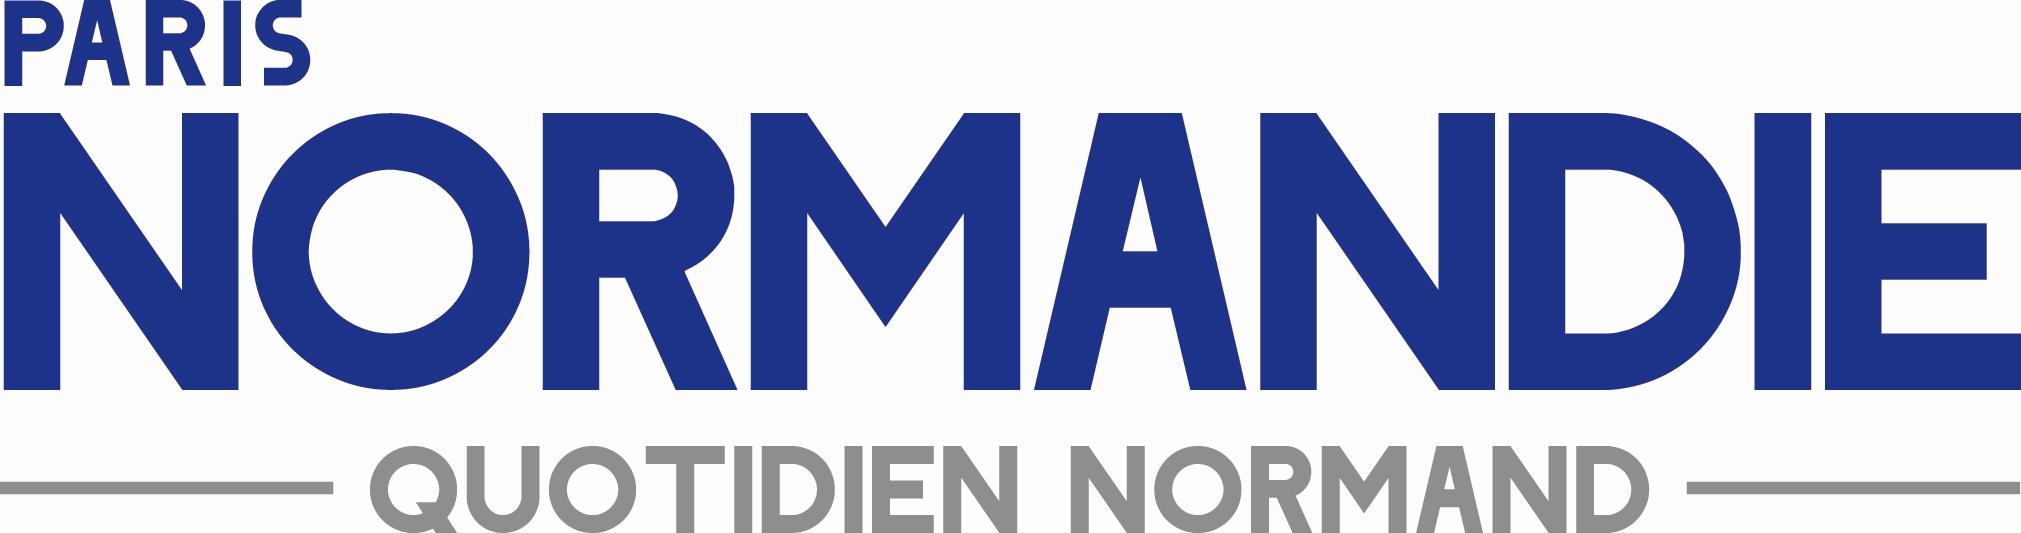 logo_3971